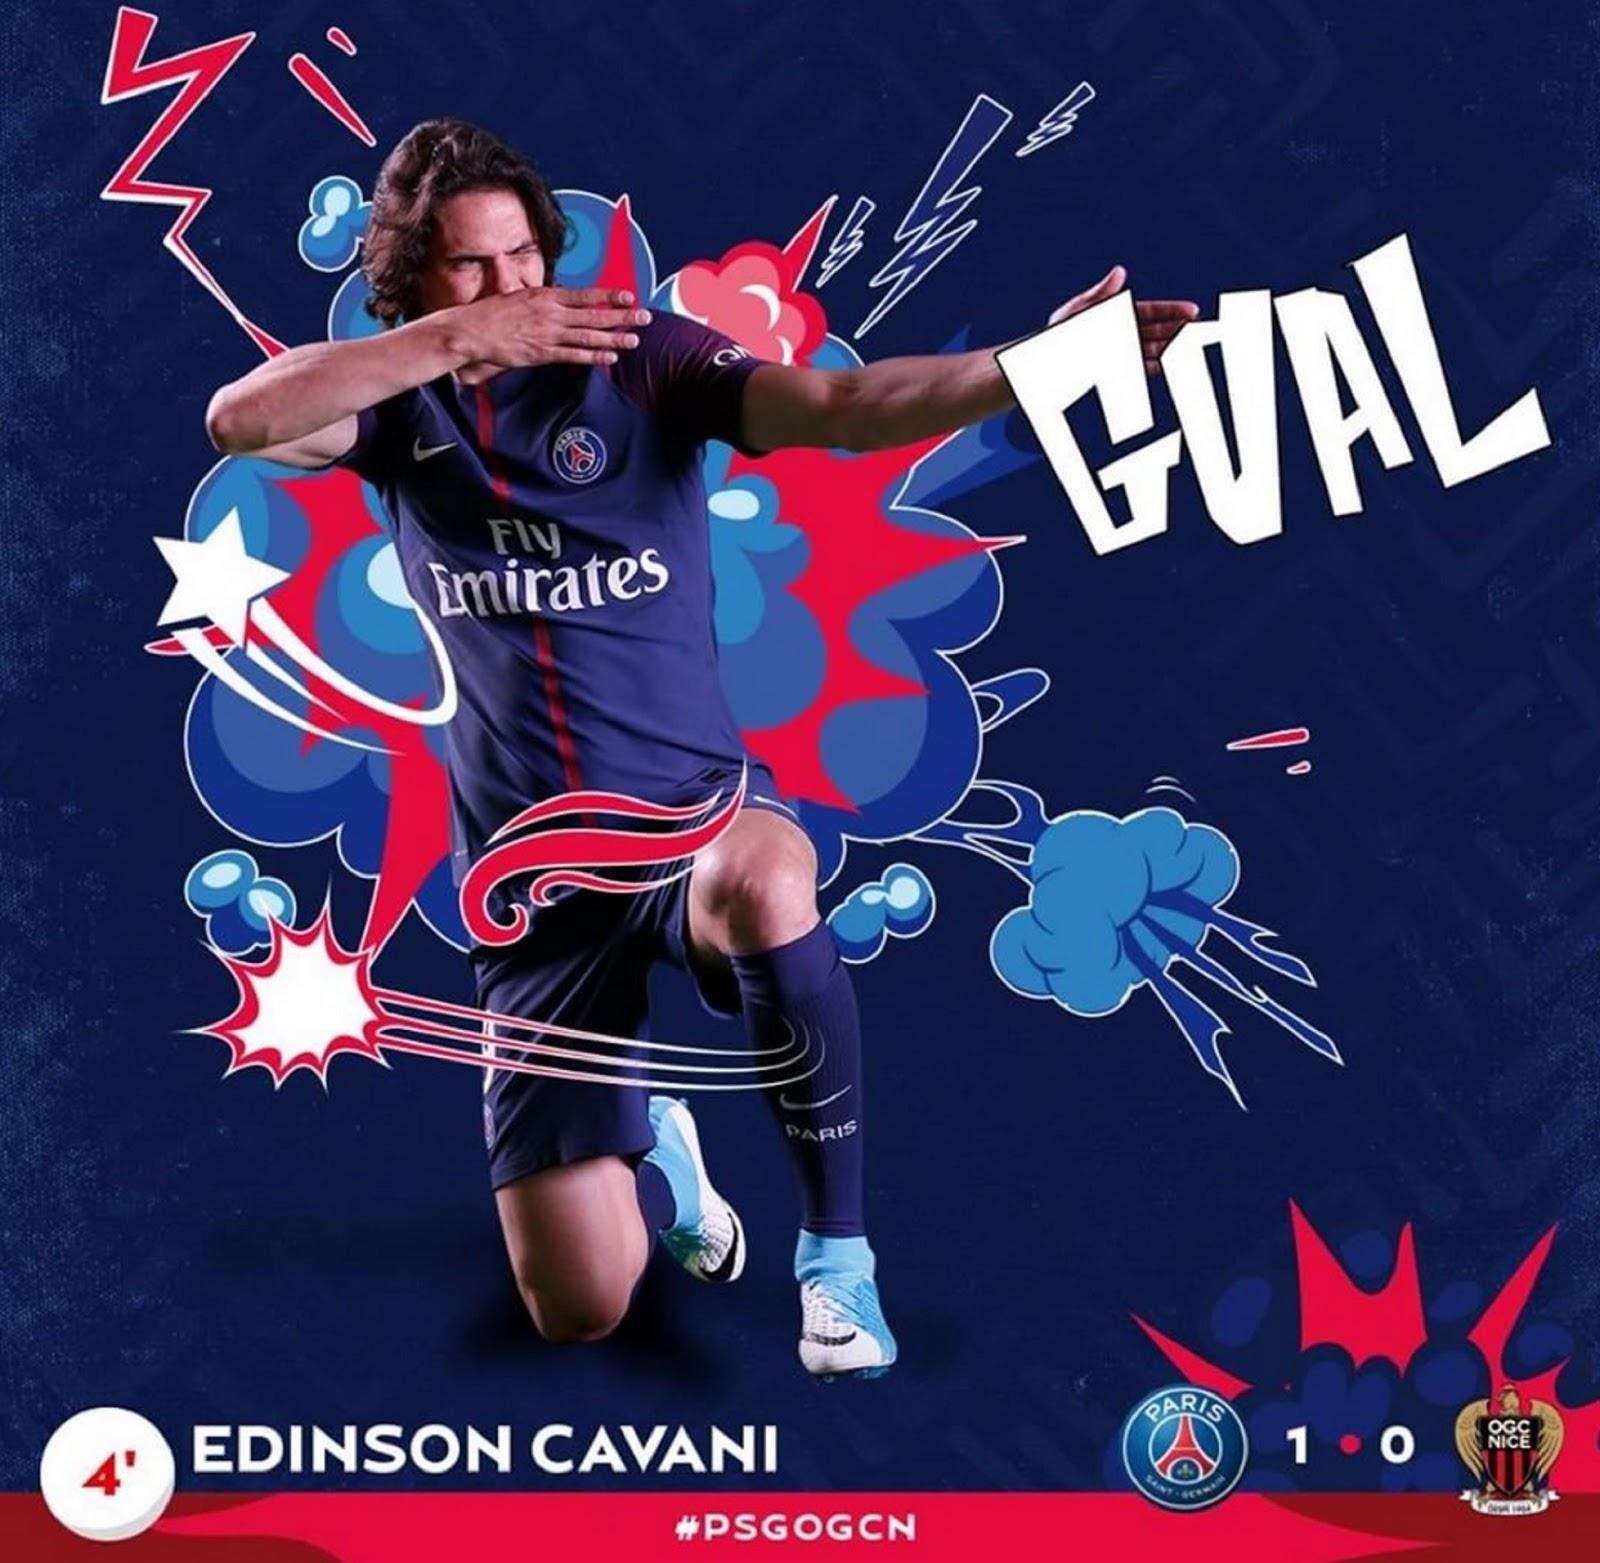 EDINSON CAVANI 8